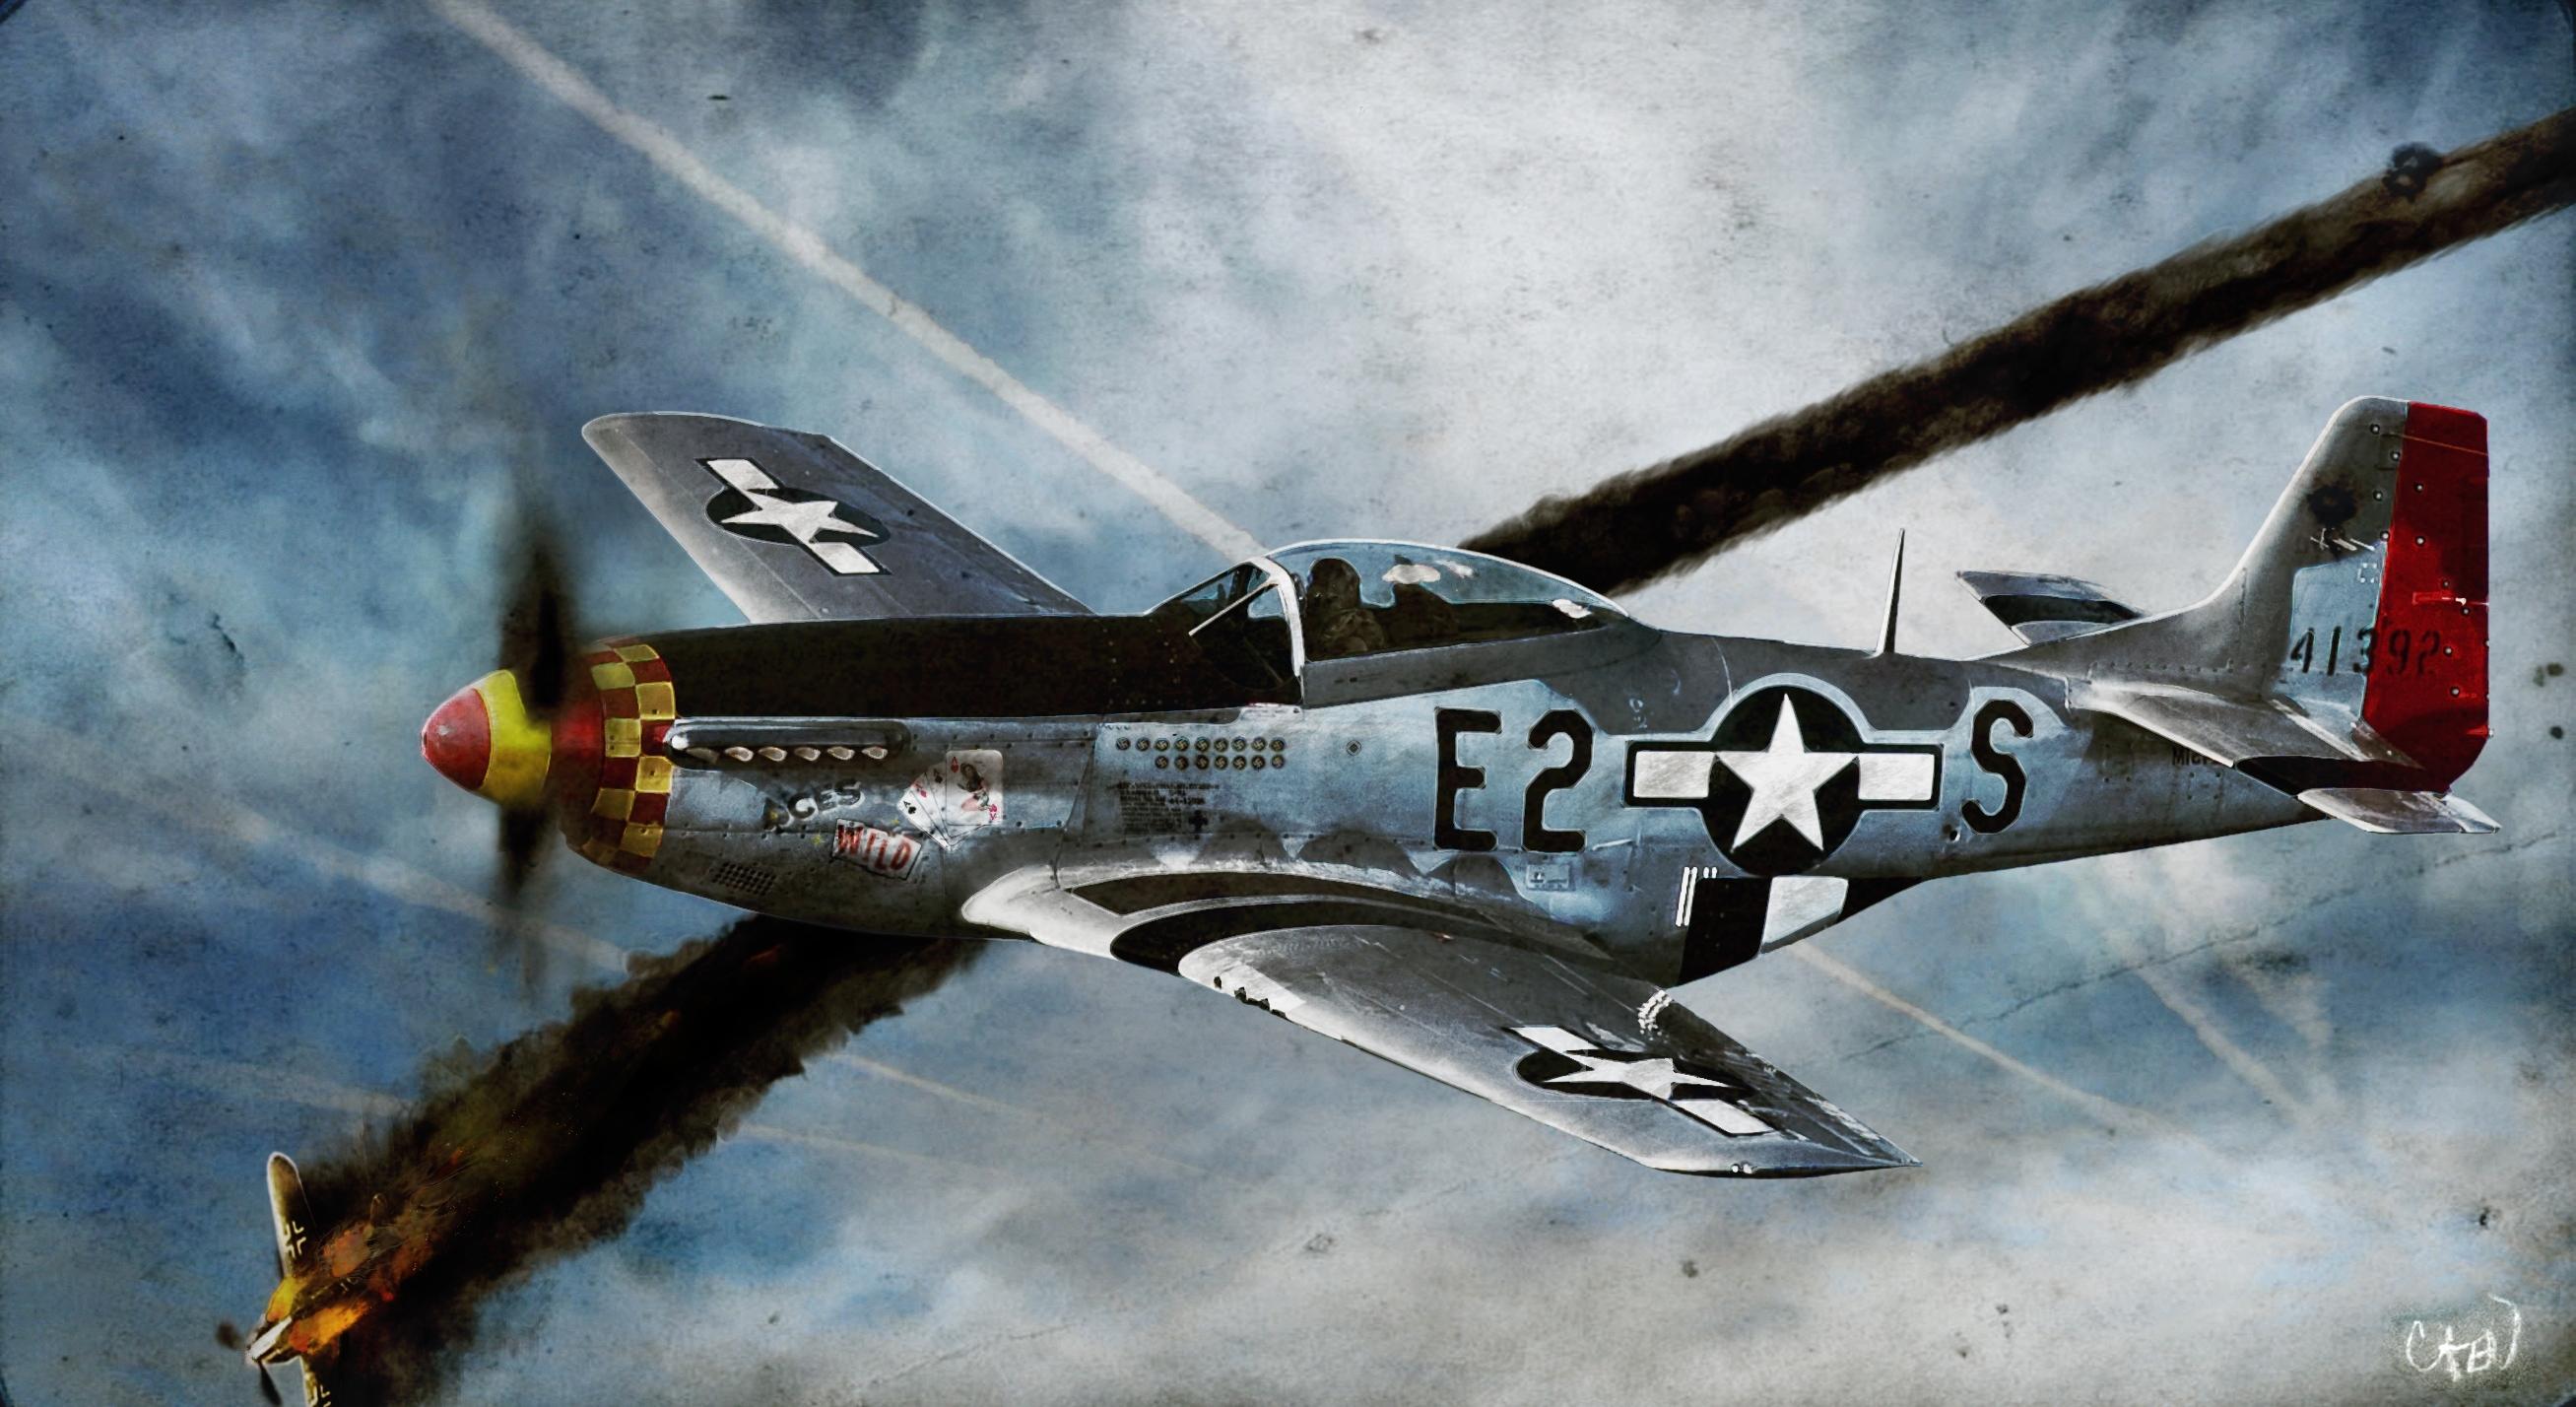 north american p-51 mustang full hd fond d'écran and arrière-plan